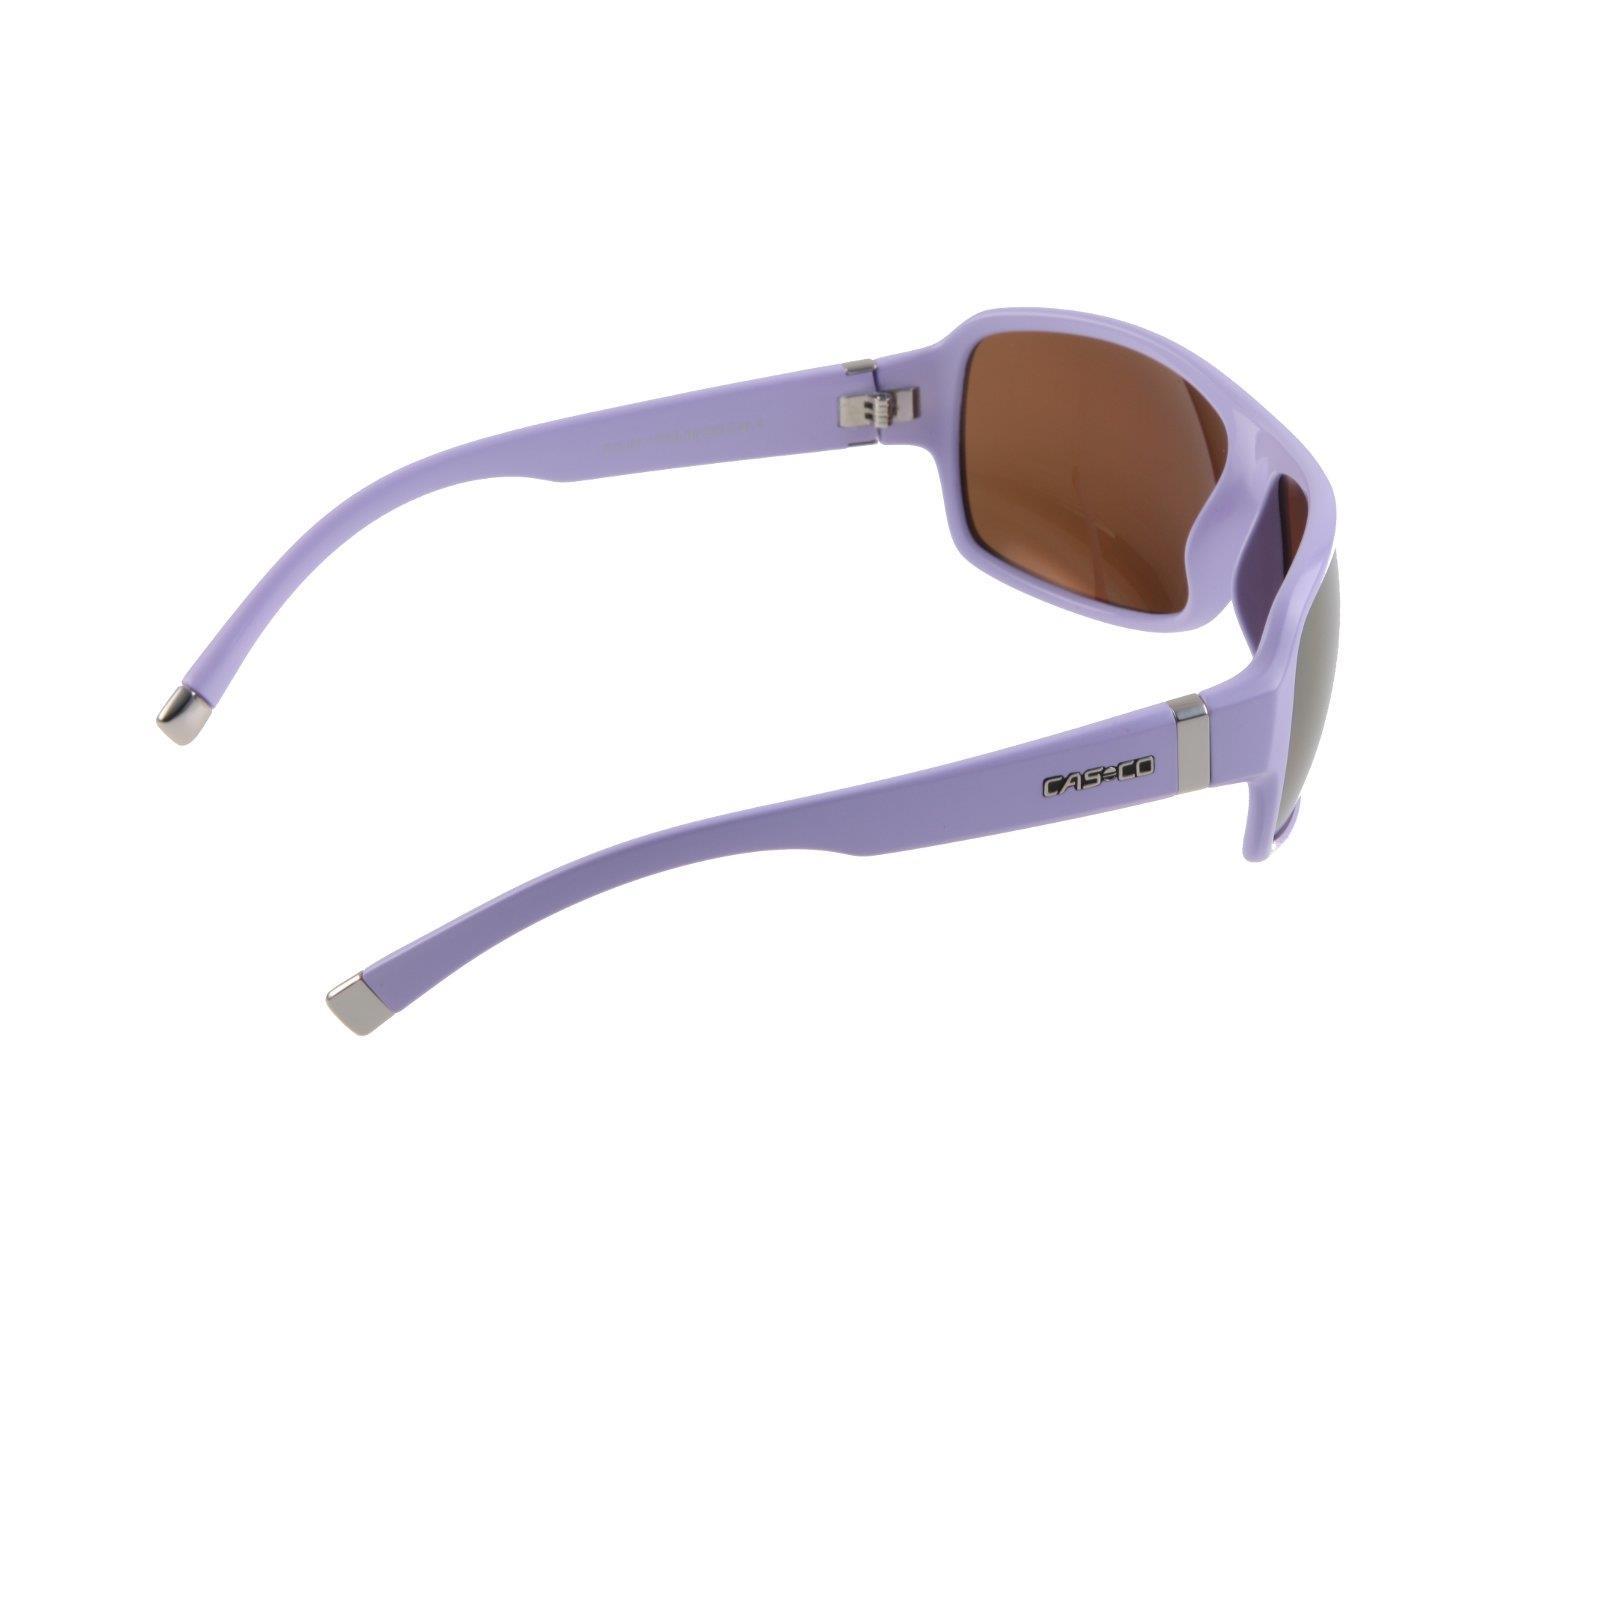 CASCO Sportbrille SX-61 Polarized Sonnenbrille Fahrrad Snowboard reflexionsarm K5IDwzZ6hU